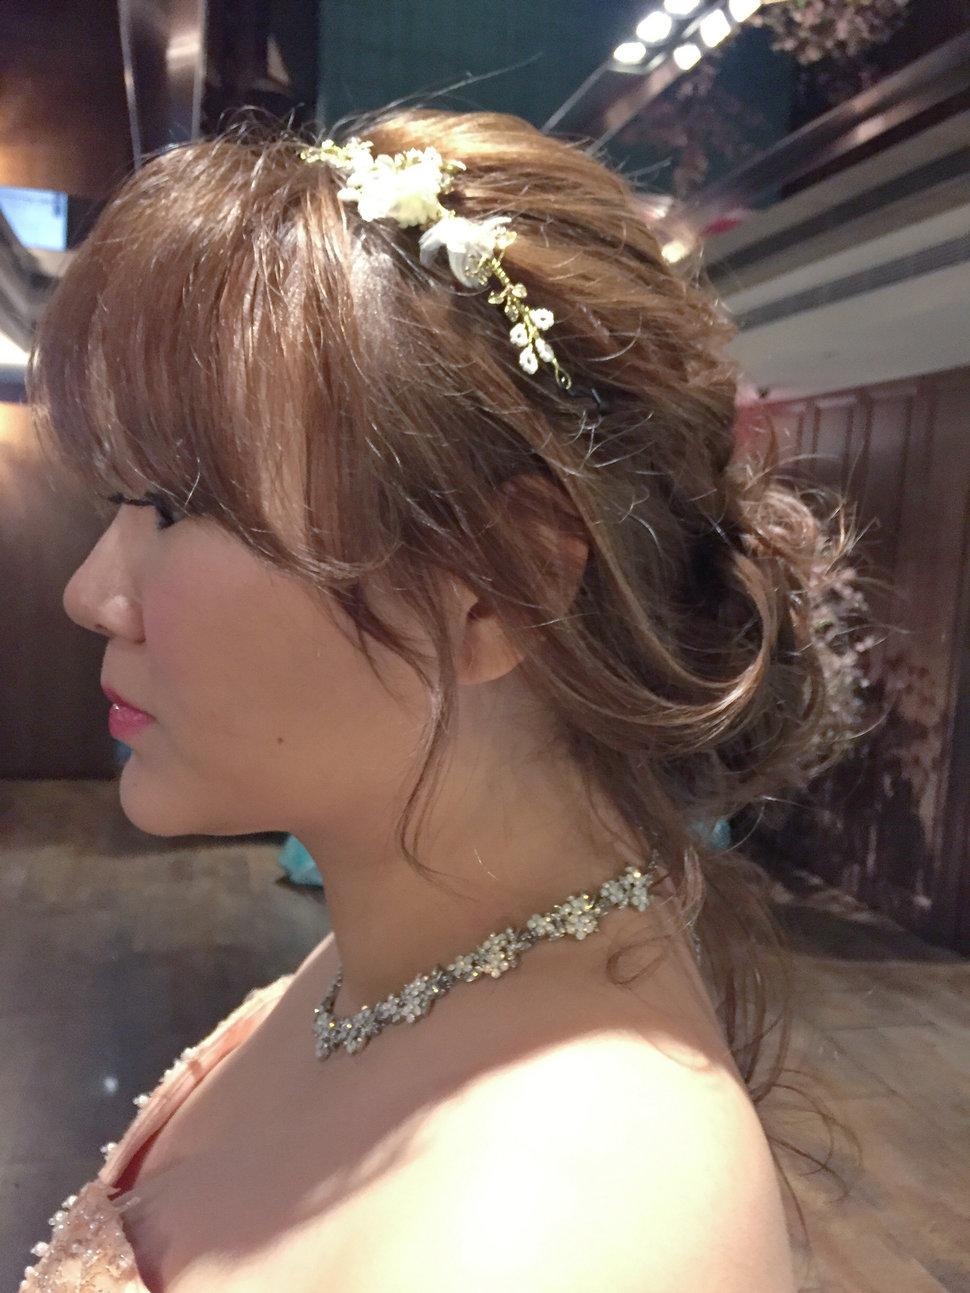 IMG_4562 - Jojo chen Makeup新娘秘書《結婚吧》